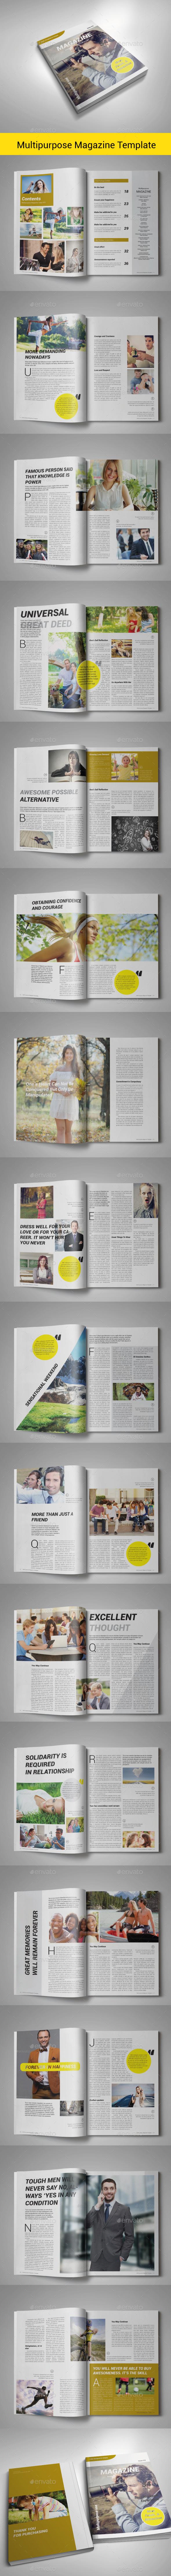 Multipurpose Magazine Template | Issue 10 - Magazines Print Templates